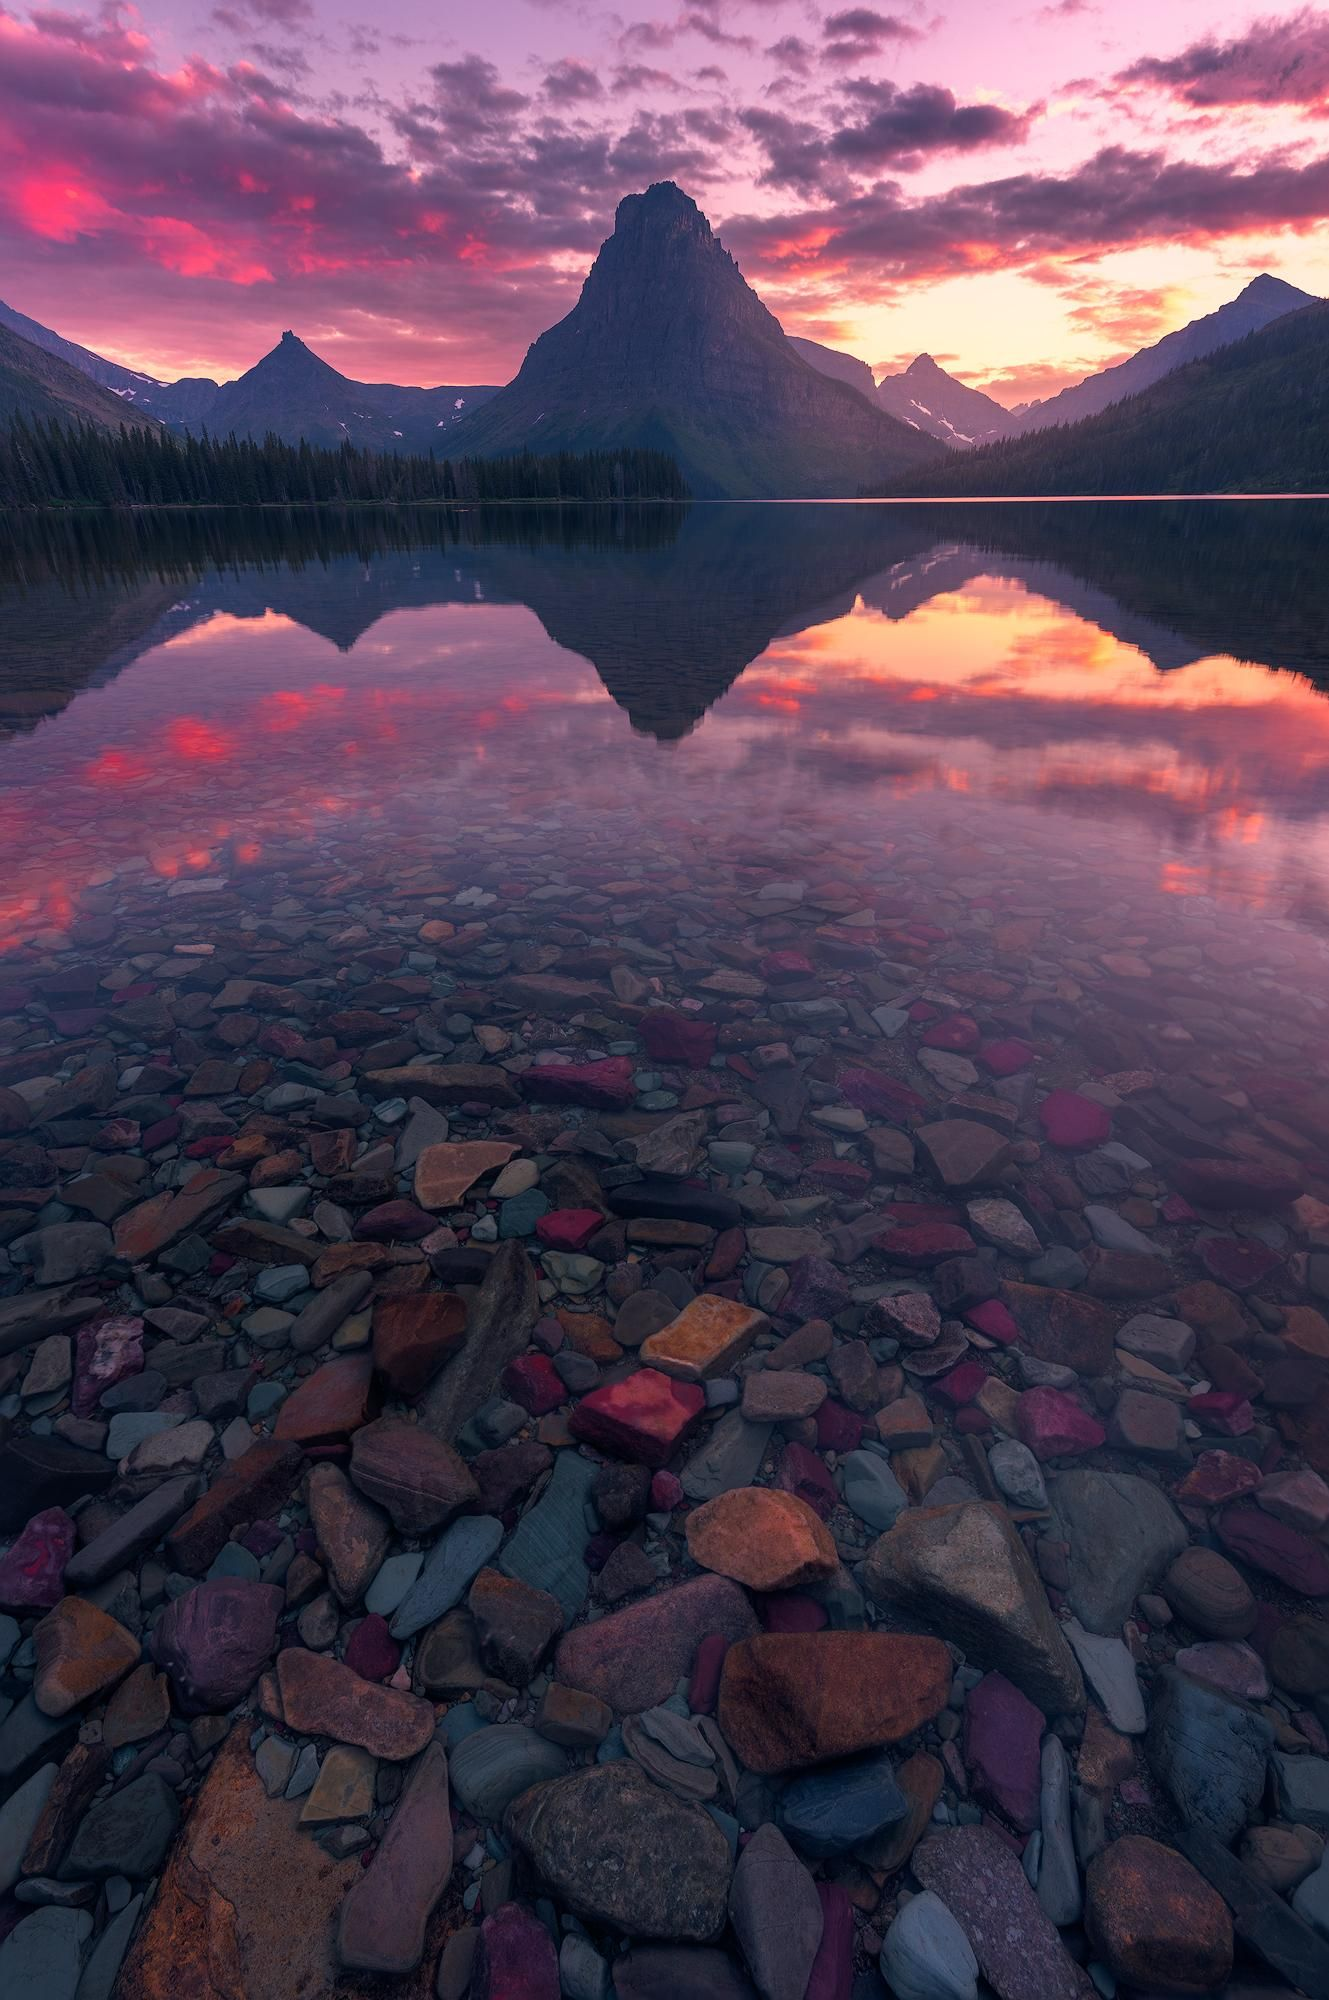 Sunset over Lake Mcdonal [Montana USA] [1329x2000] [OC] #amazing #beautiful #photography #earth #scenery